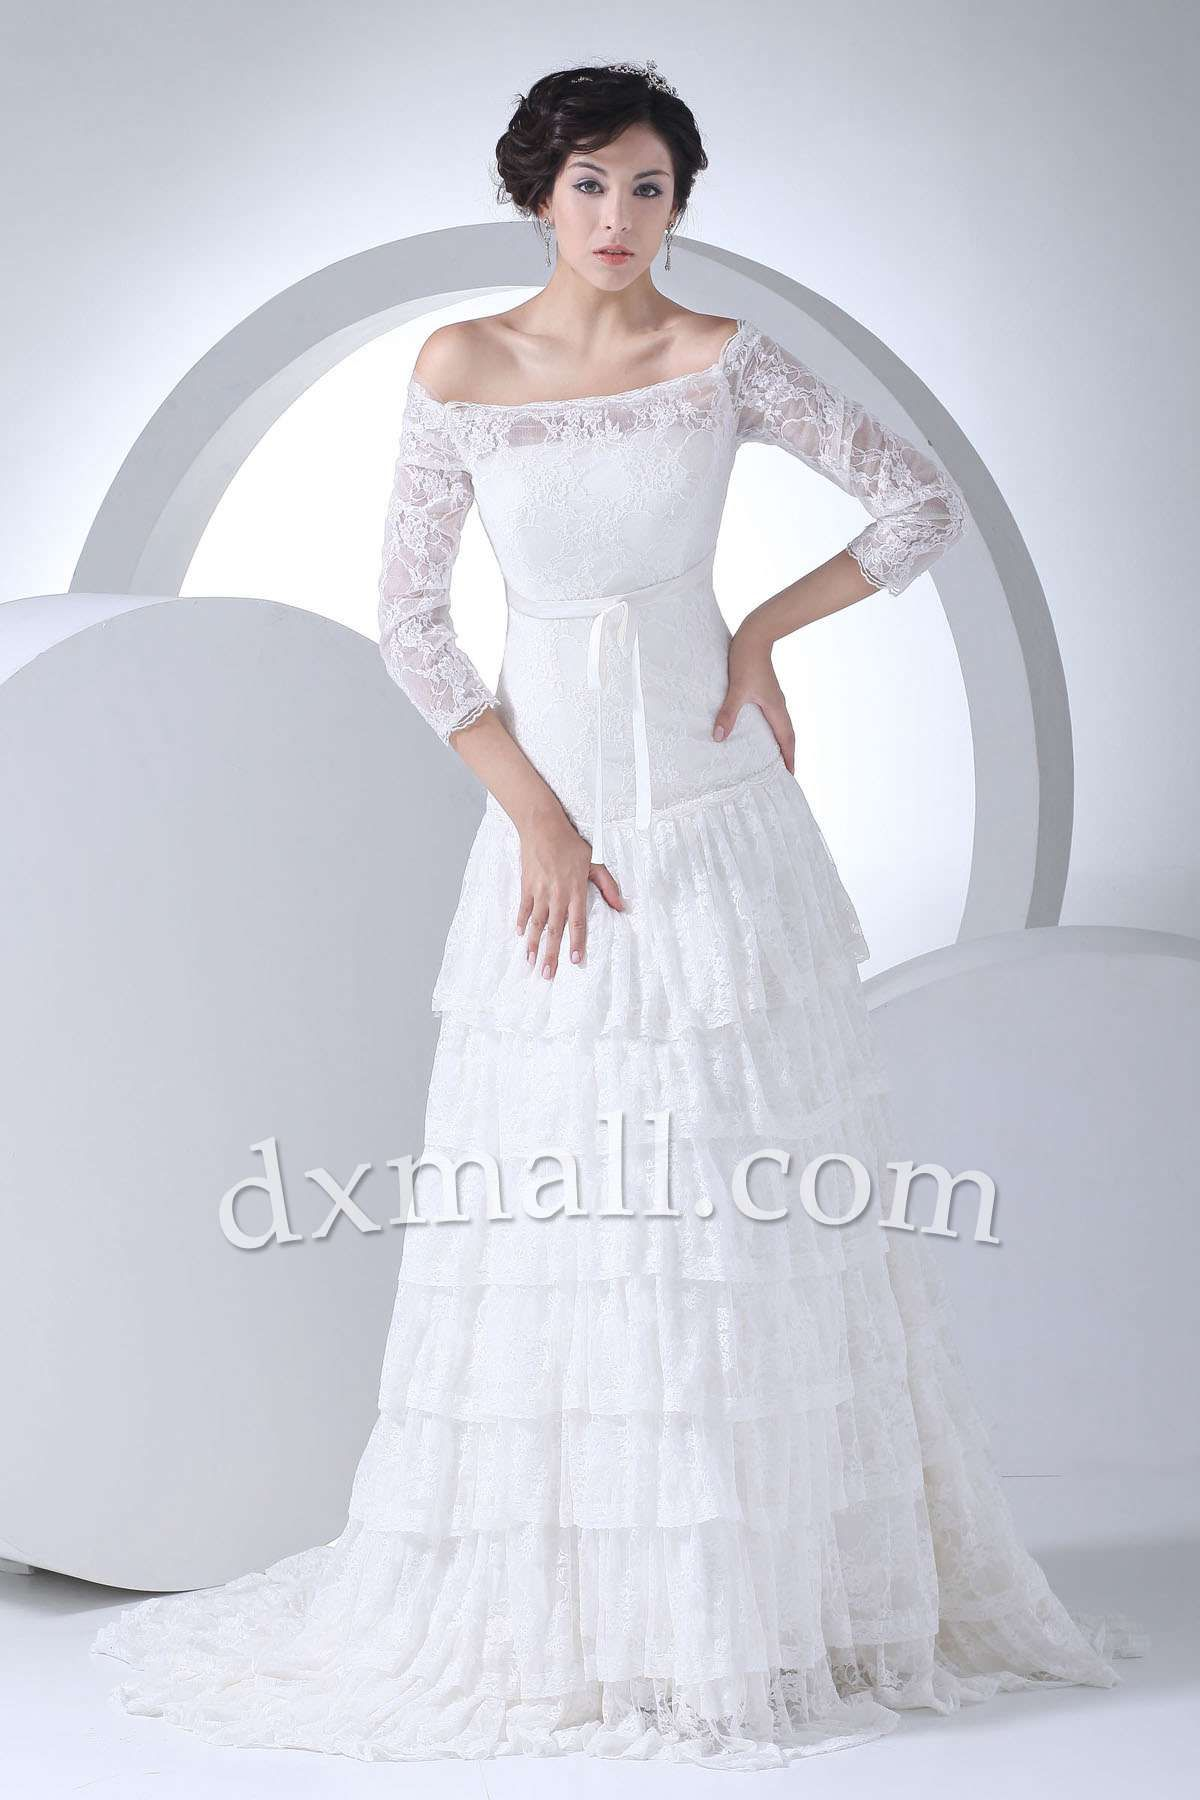 Short maternity wedding dresses  Aline Wedding Dresses Off The Shoulder Court Train Chiffon Satin